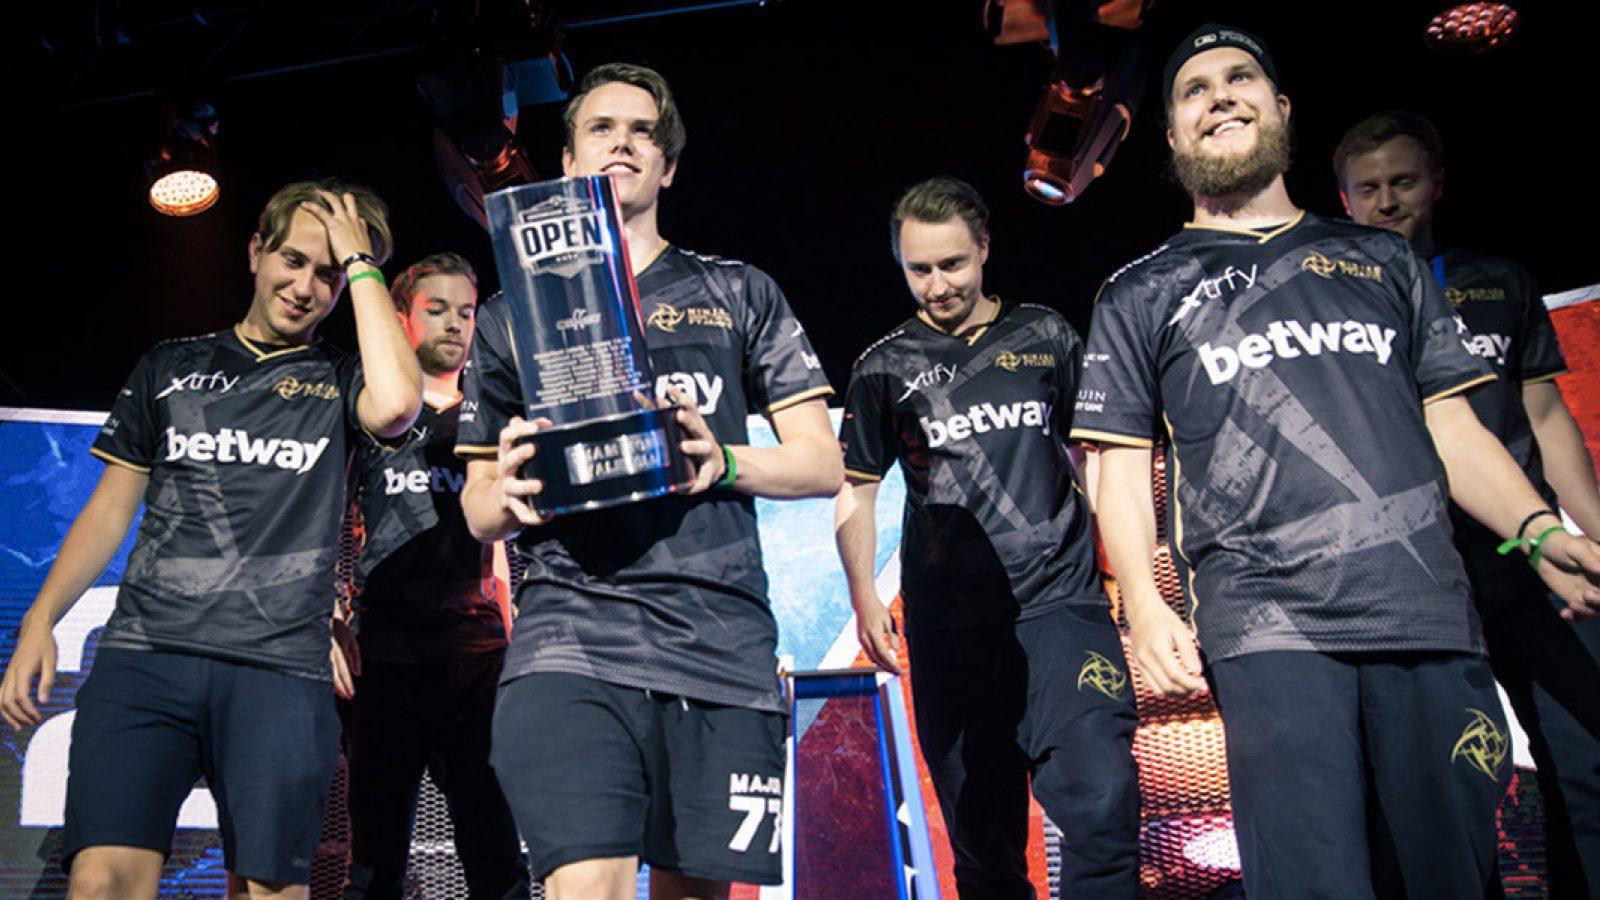 NiP defeated by Evil Geniuses in StarSeries I-league season